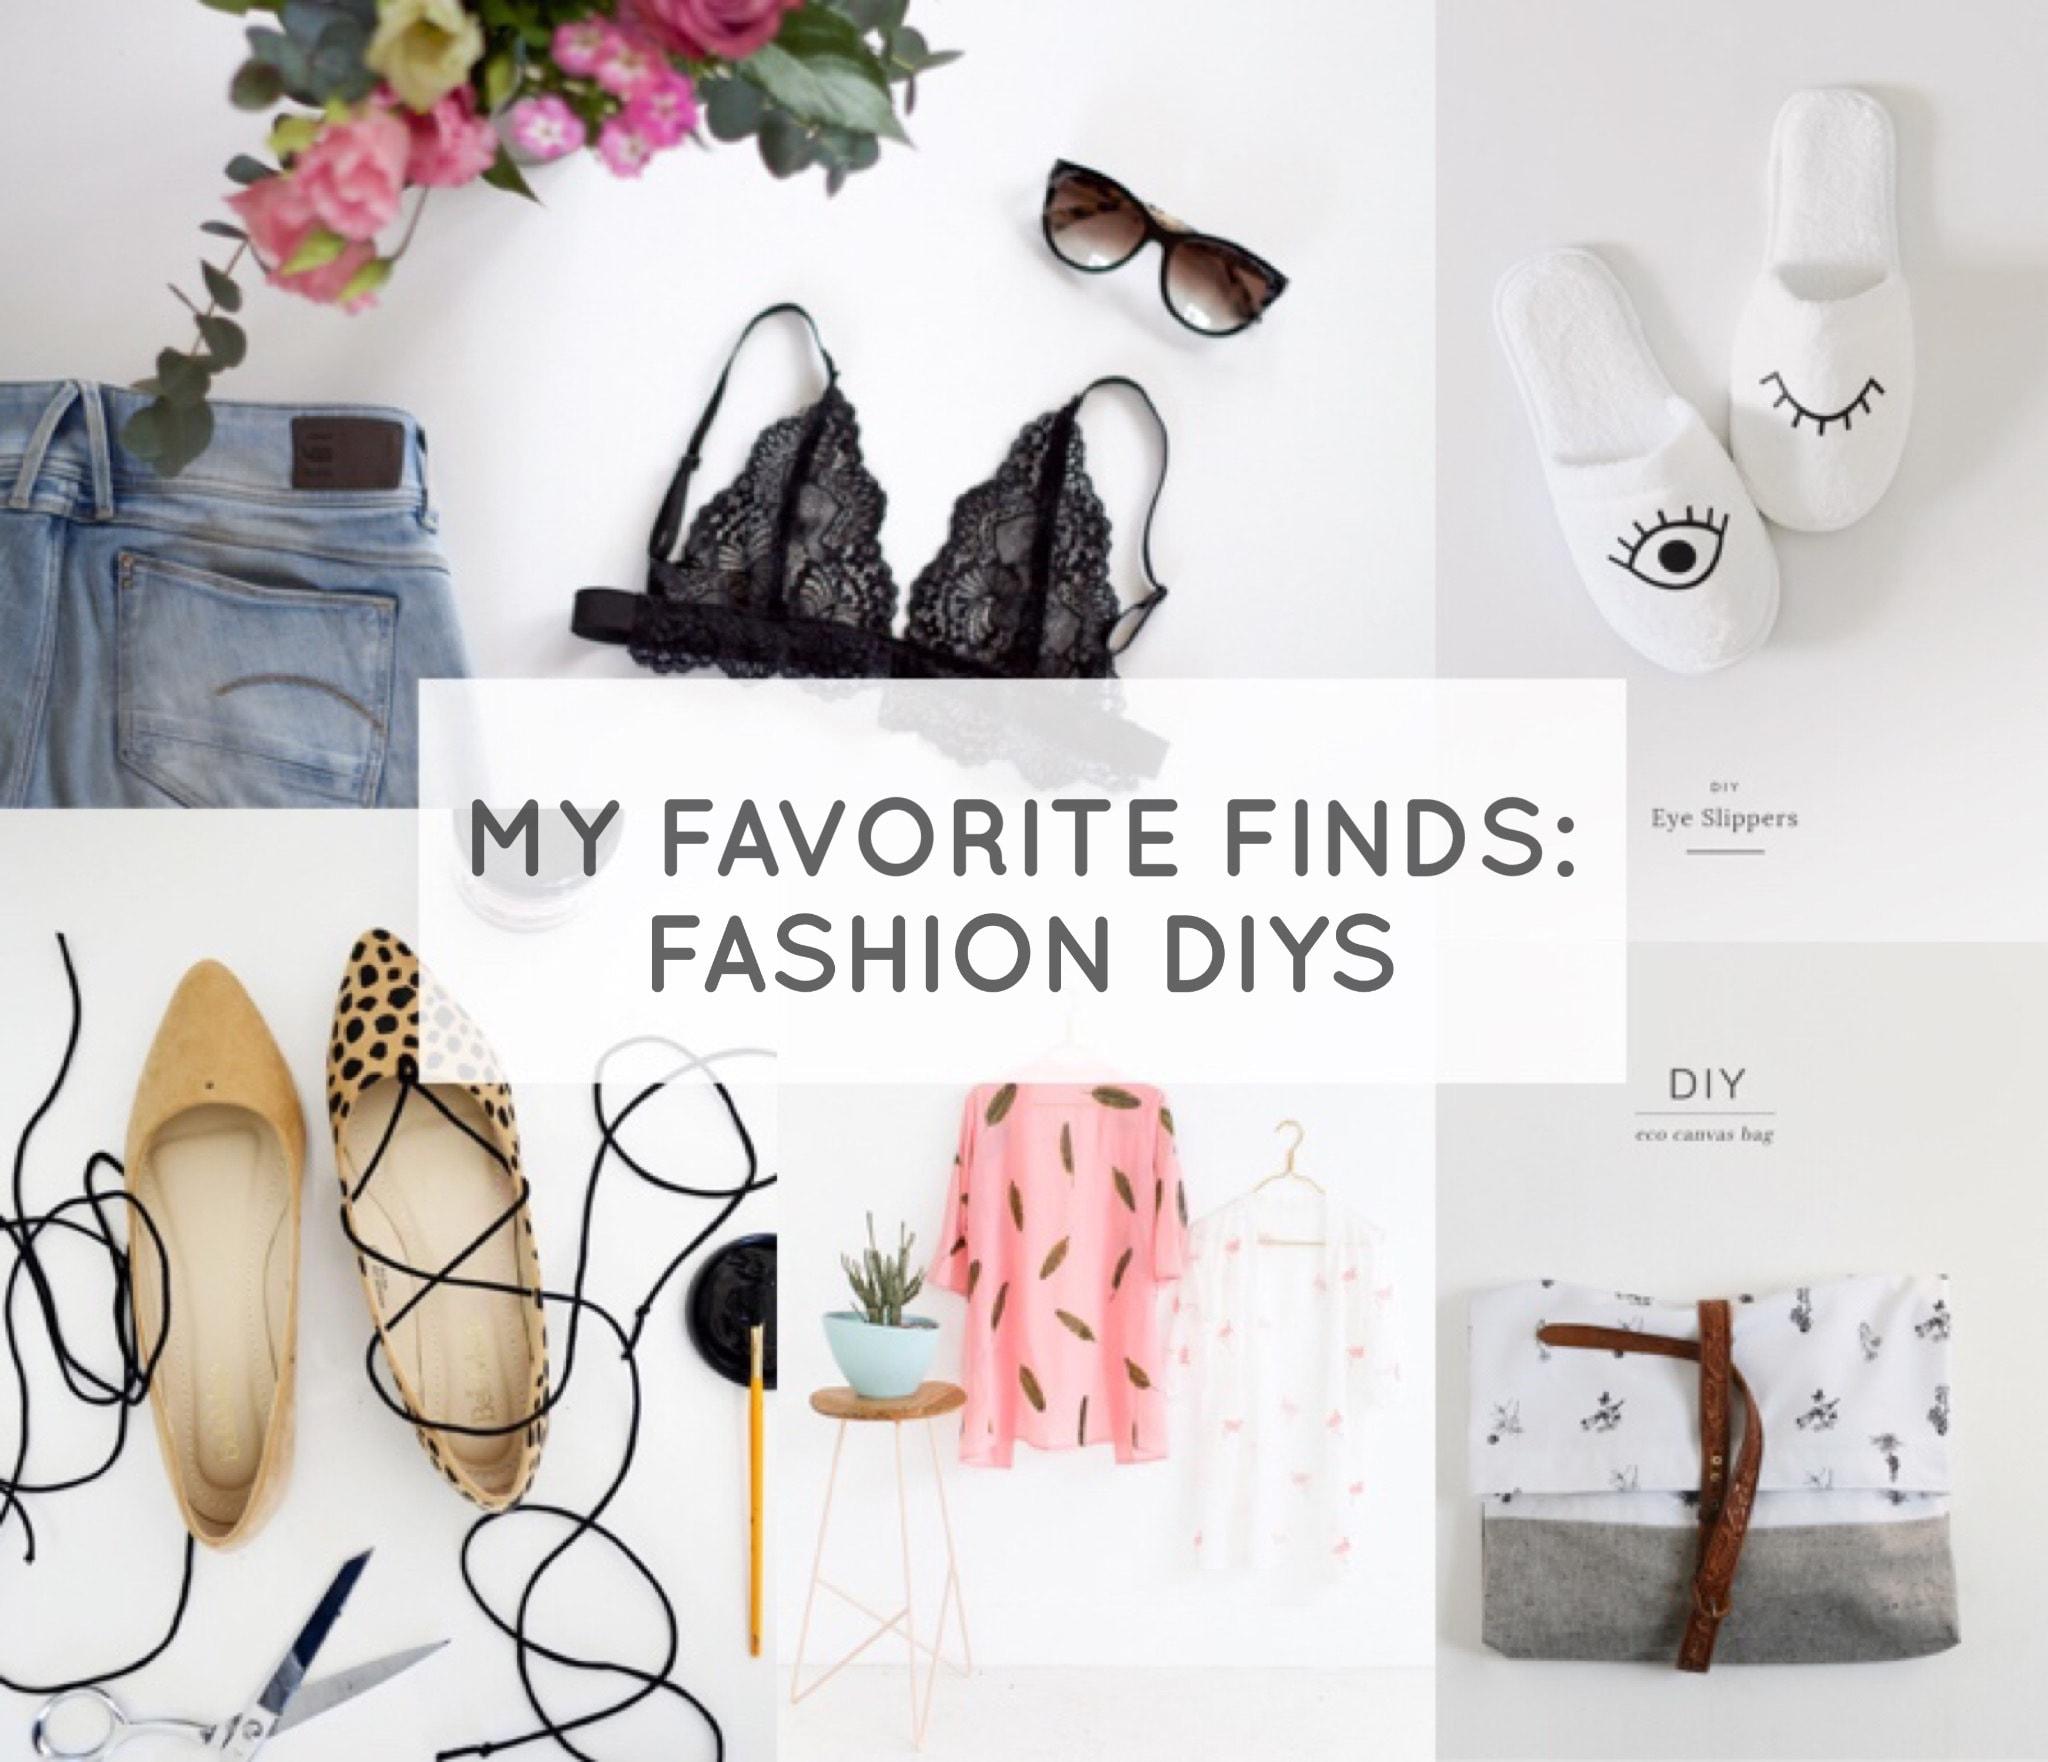 My Favorite Finds: Fashion DIYs